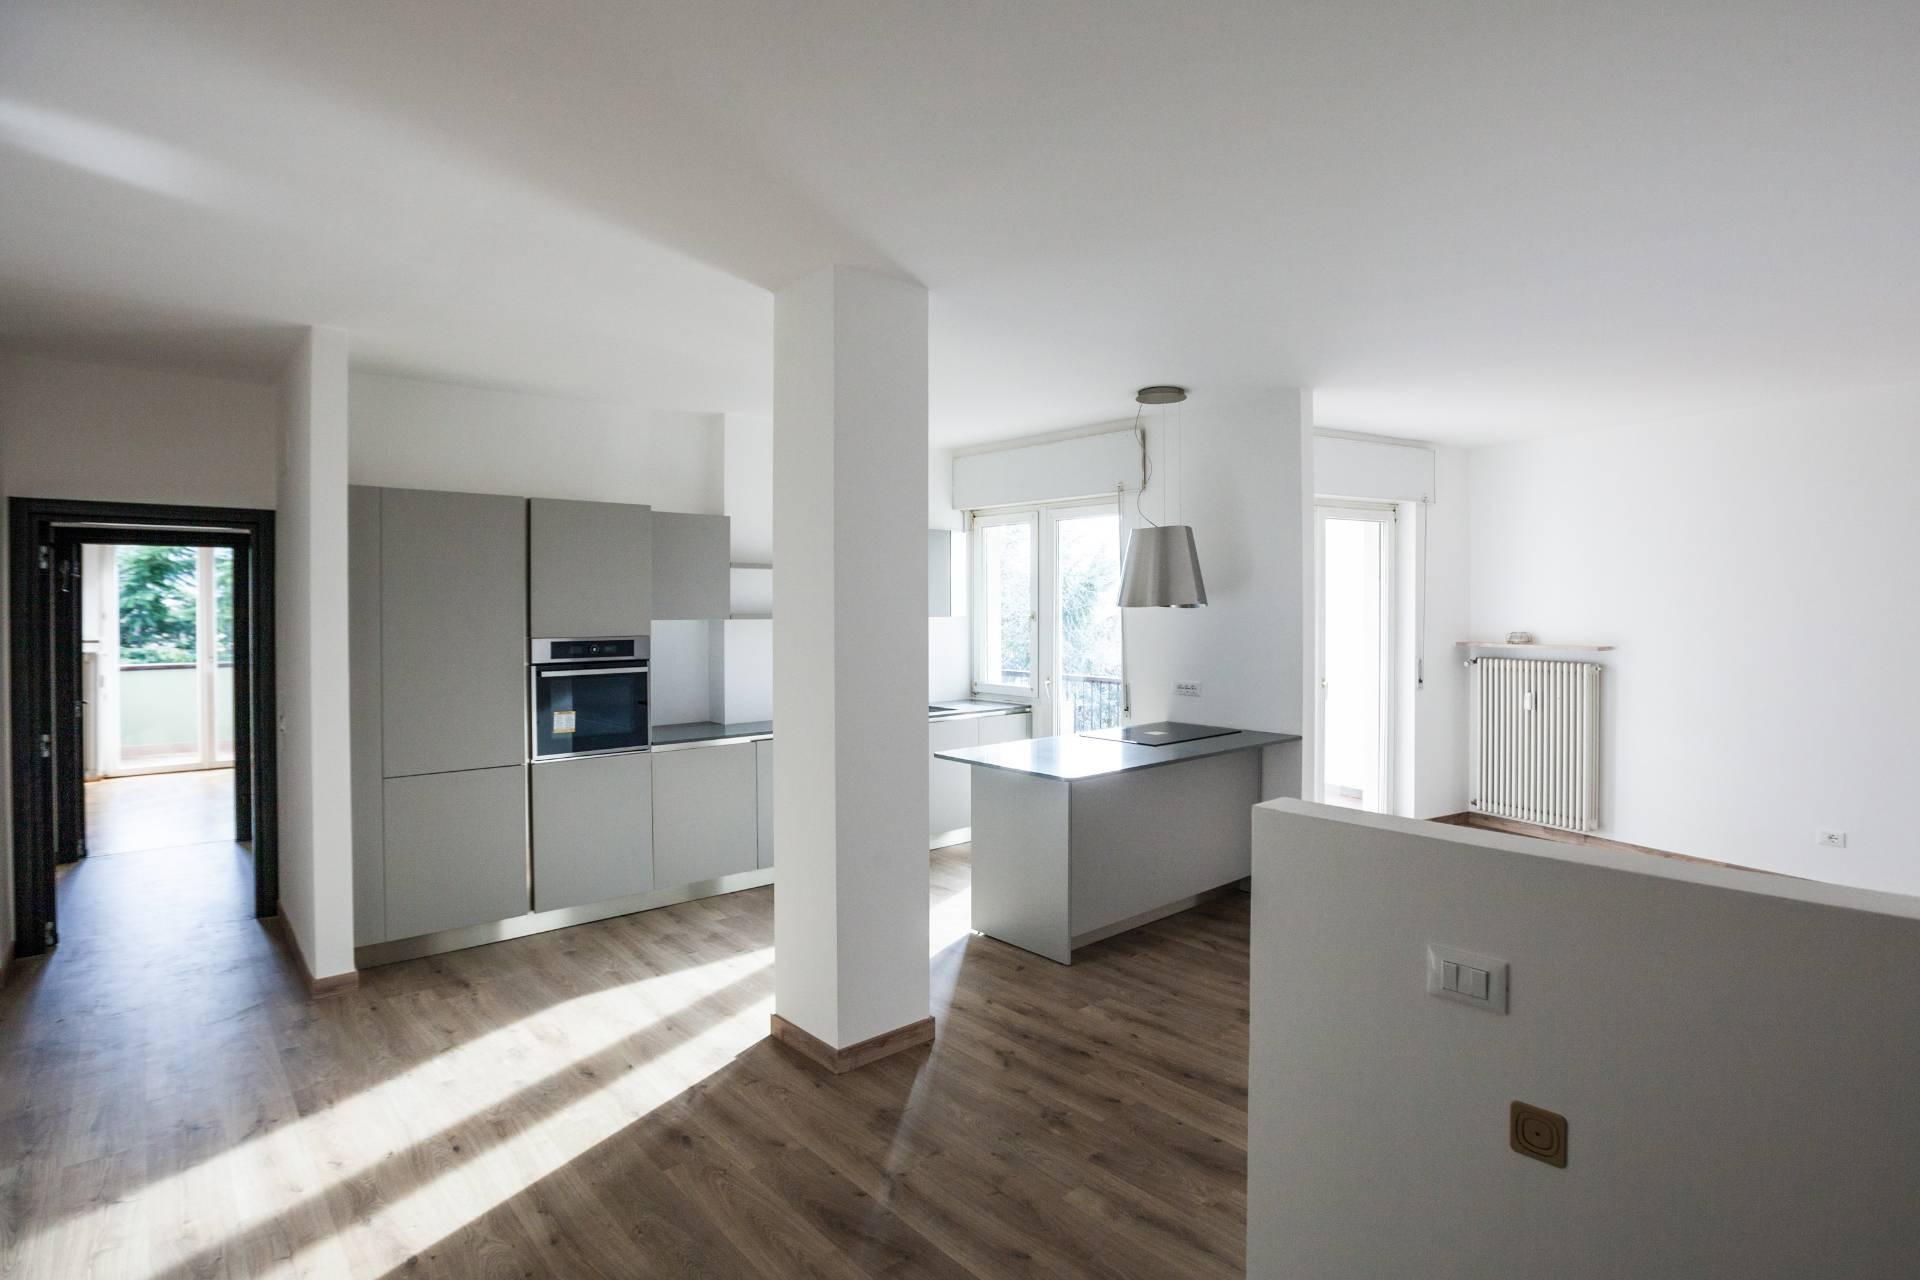 bolzano affitto quart: residenziale affitta-presto-agenzia-bolzano